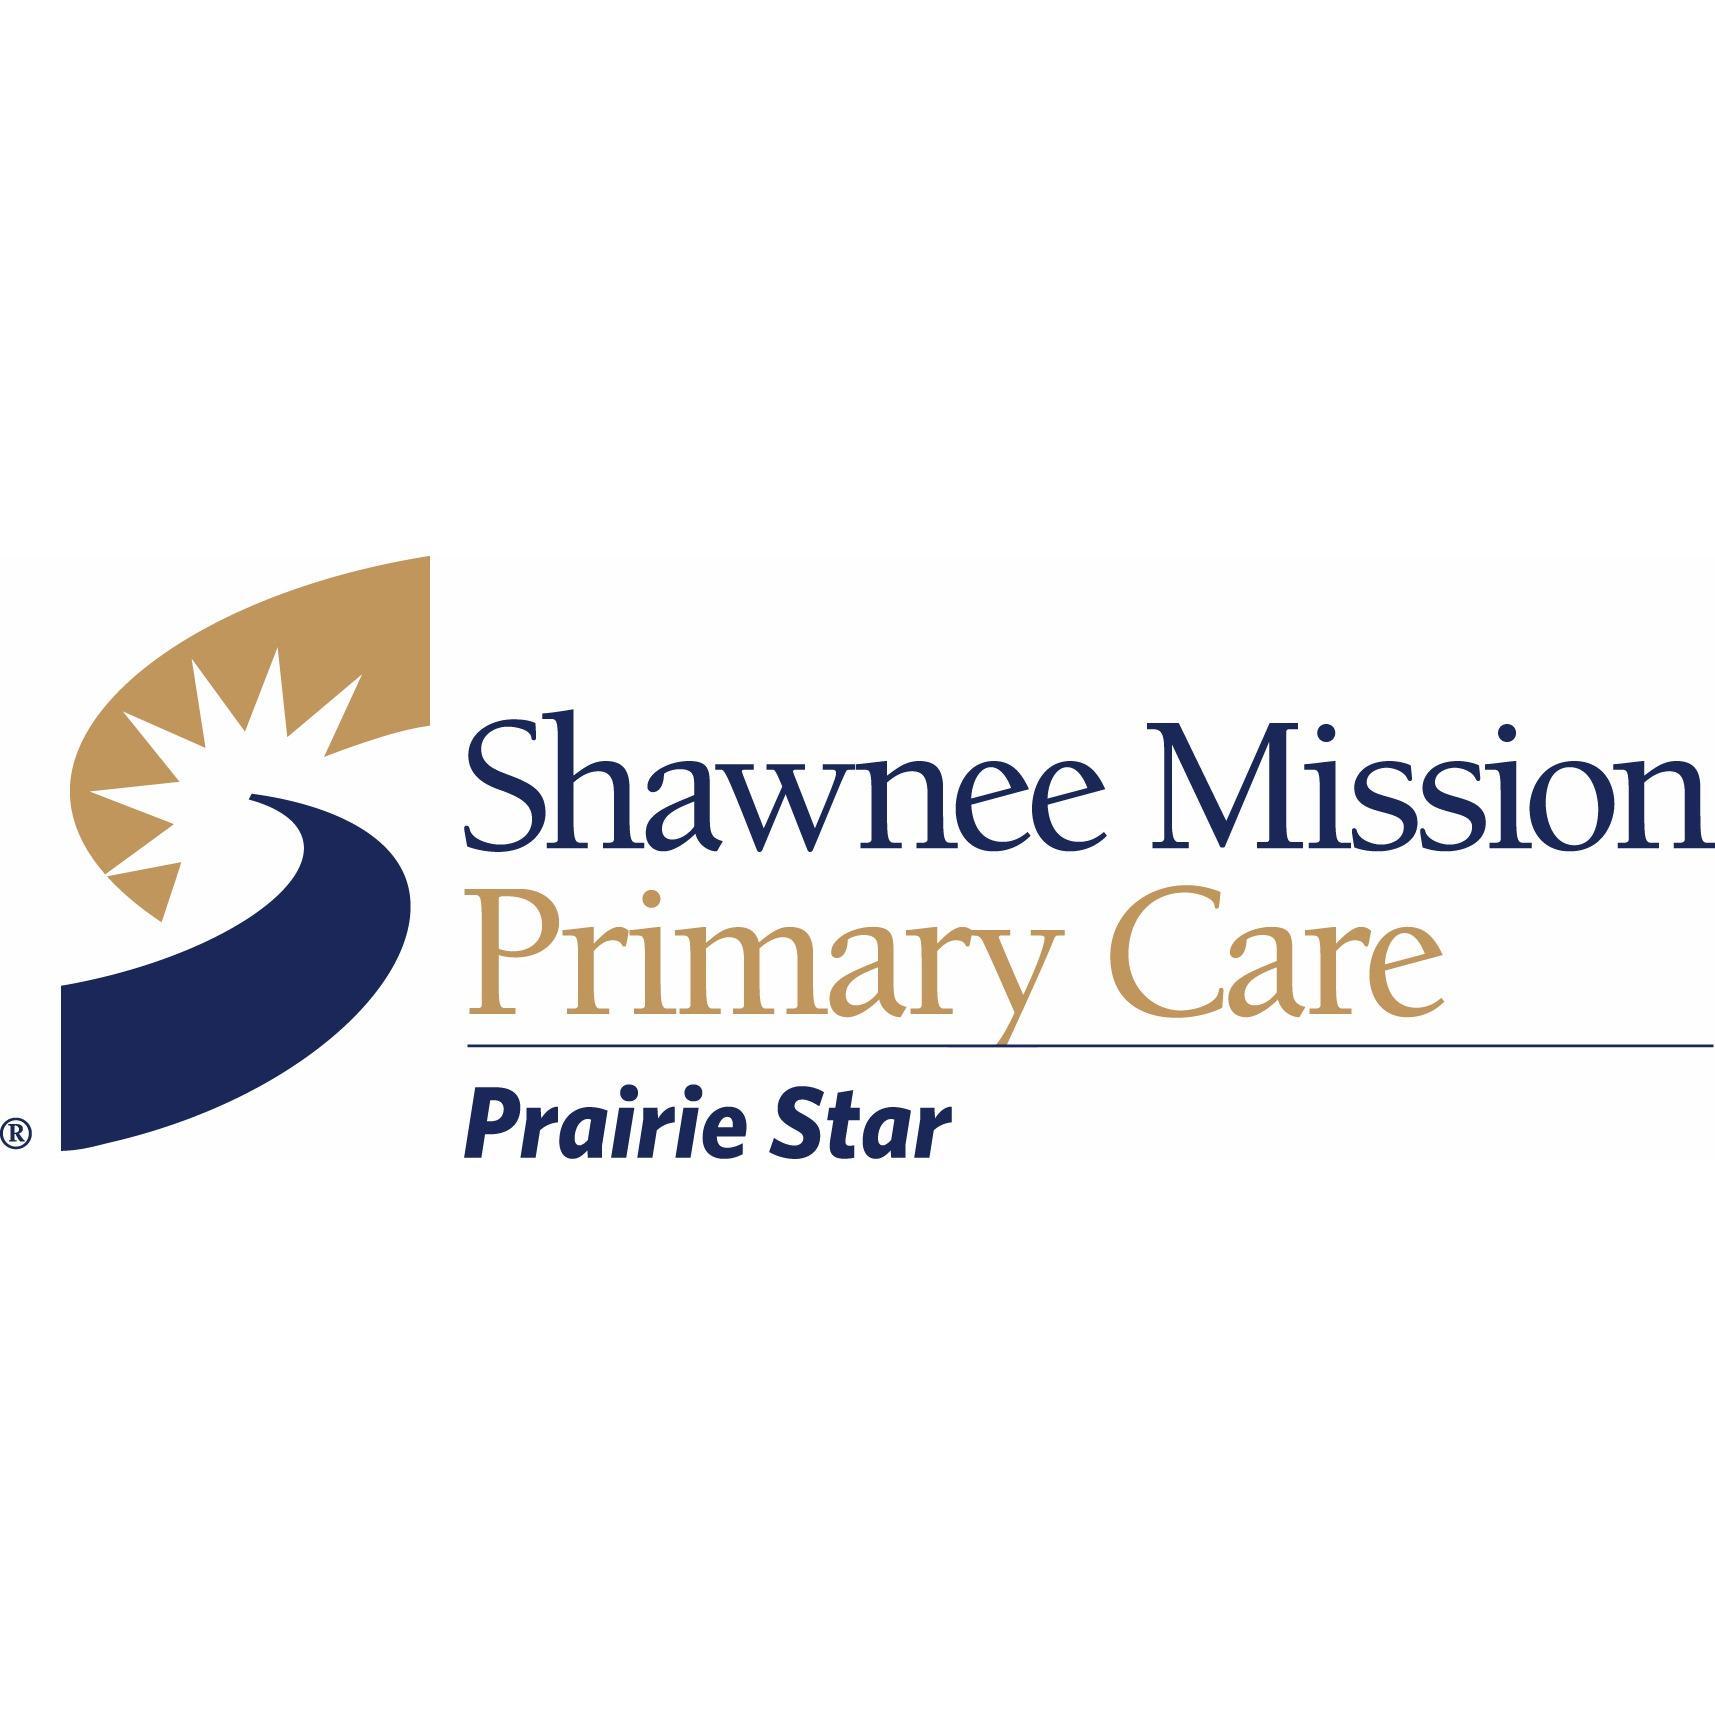 Shawnee Mission Primary Care - Deer Creek - Overland Park, KS 66223 - (913)632-9500 | ShowMeLocal.com